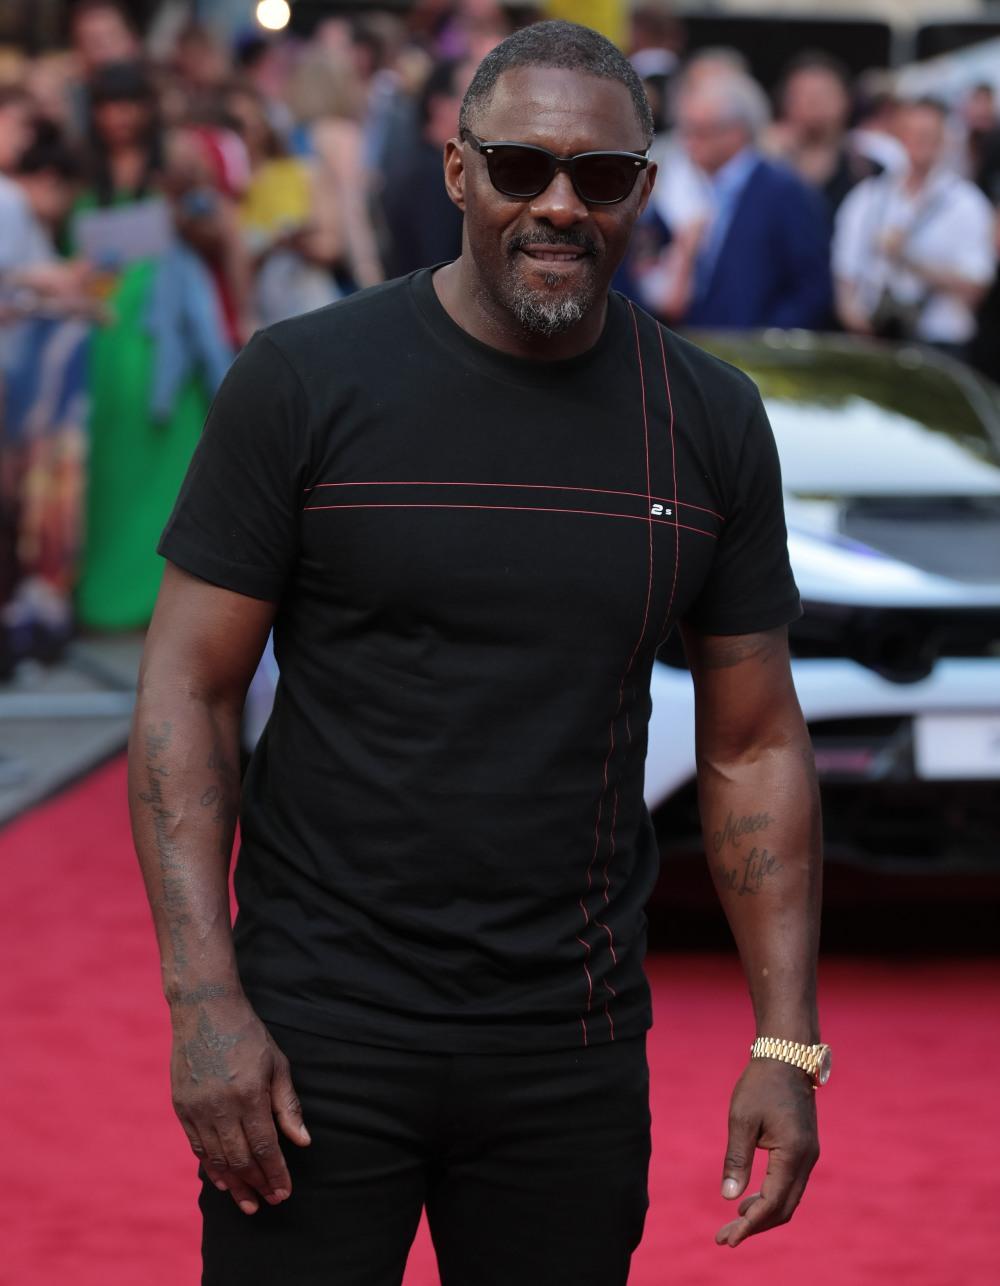 Idris Elba at 'Fast & Furious Presents: Hobbs & Shaw' film premiere, London, UK